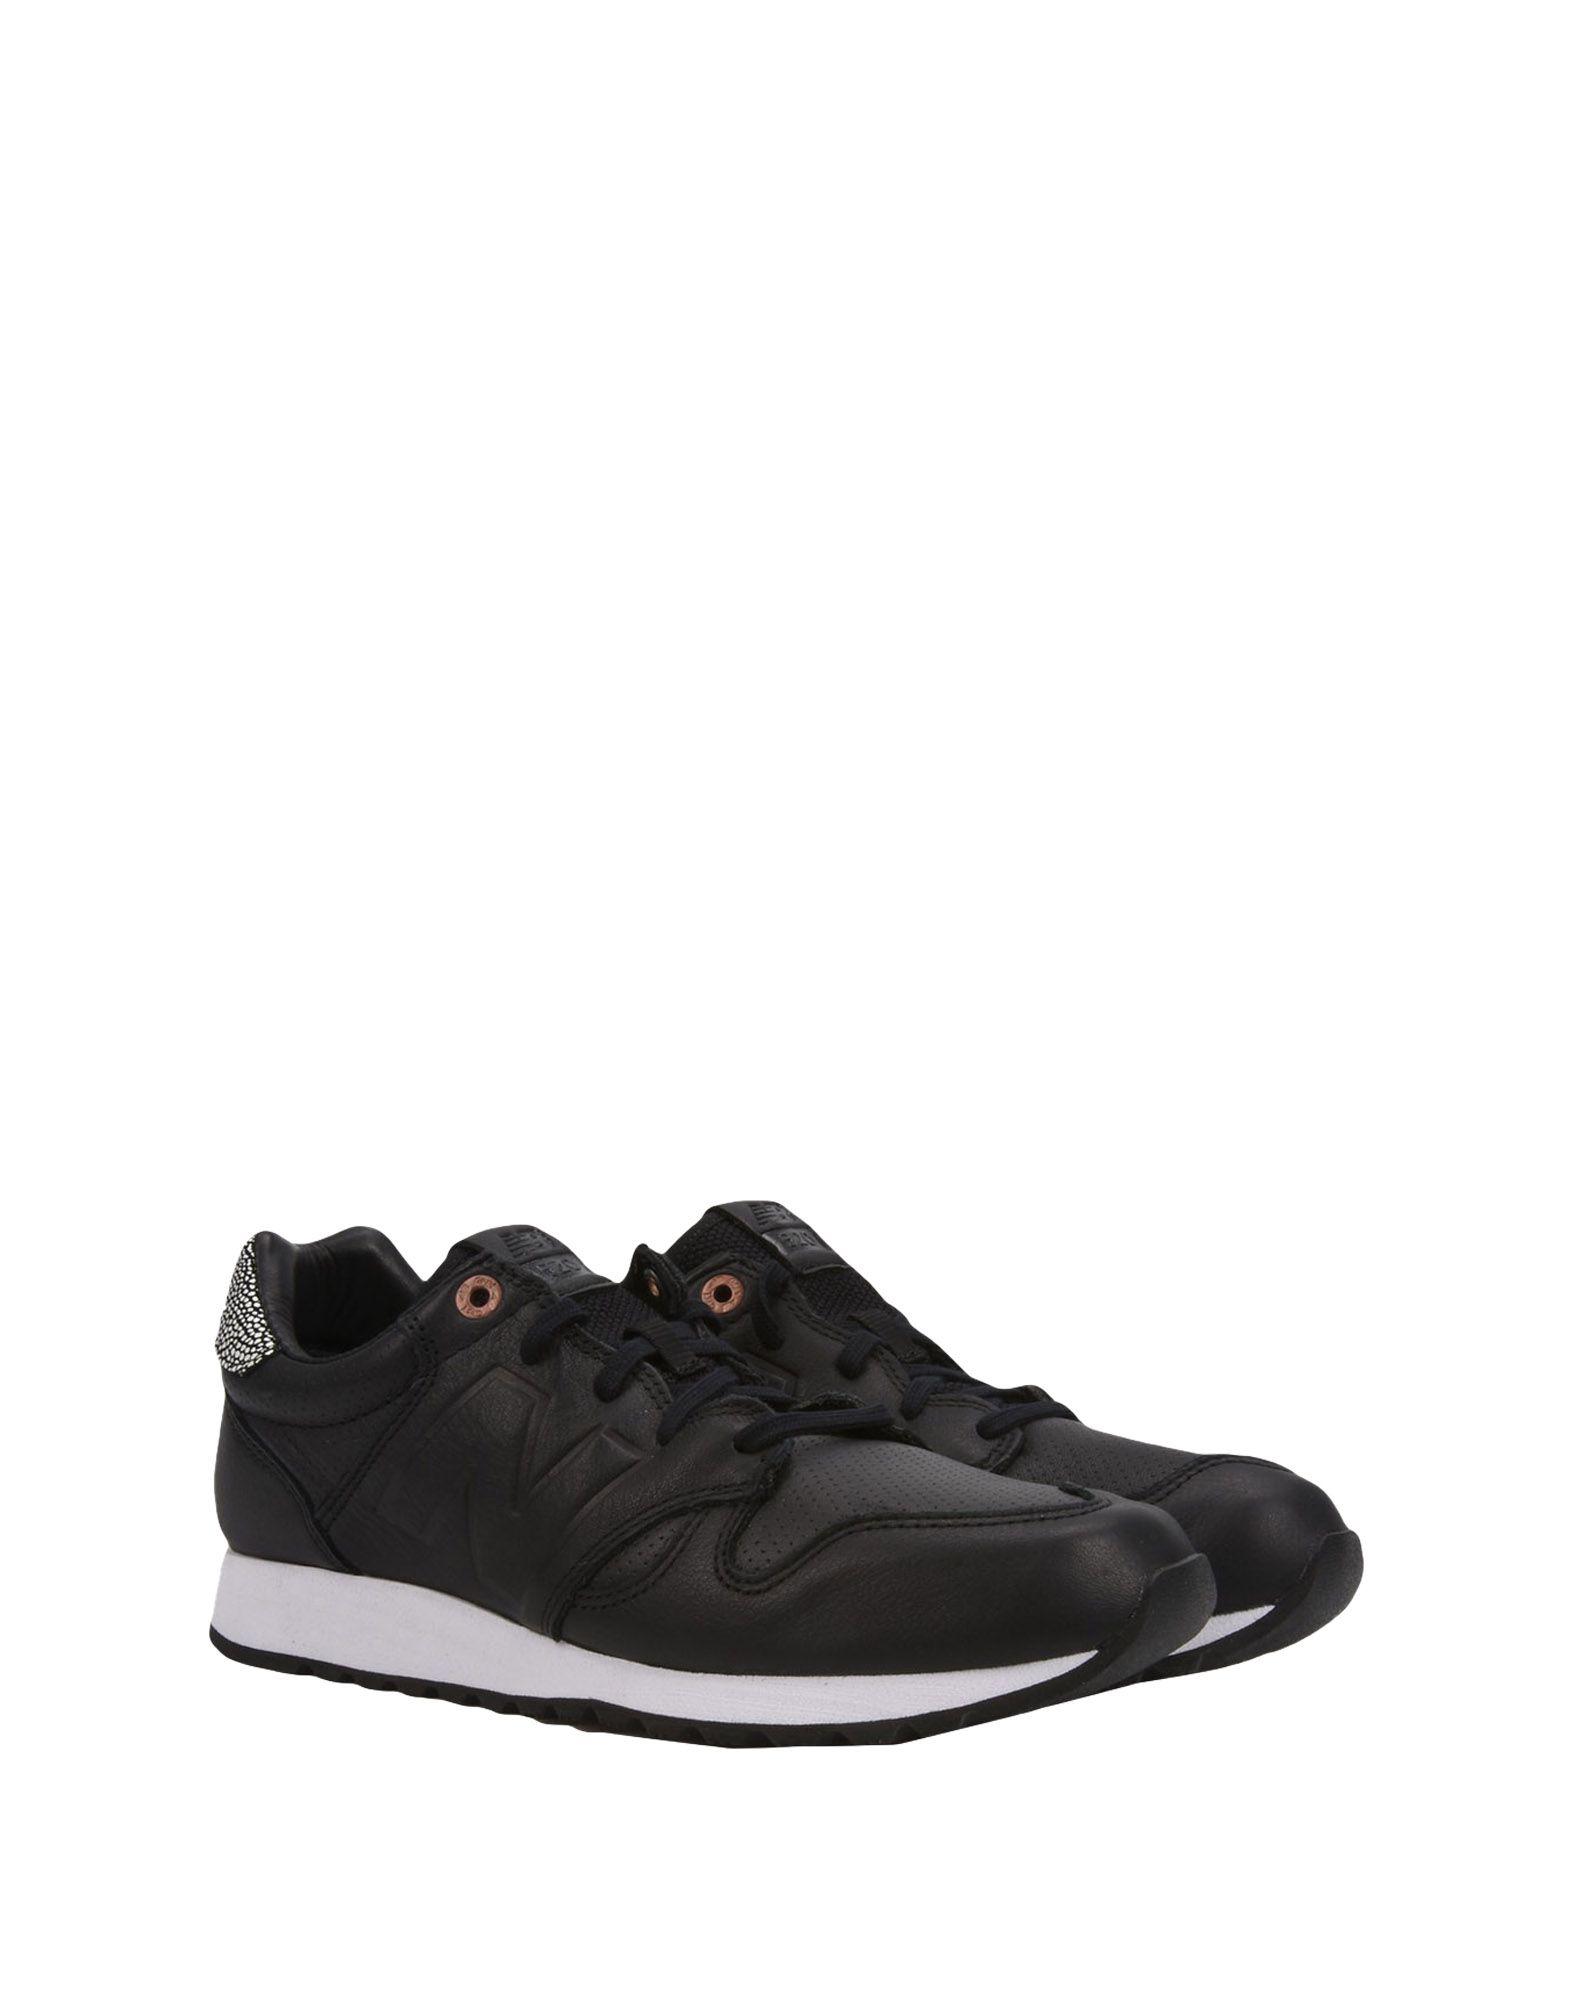 New Balance 520 Grey Pack Pack Pack  11341507LX Gute Qualität beliebte Schuhe 6c9c0f